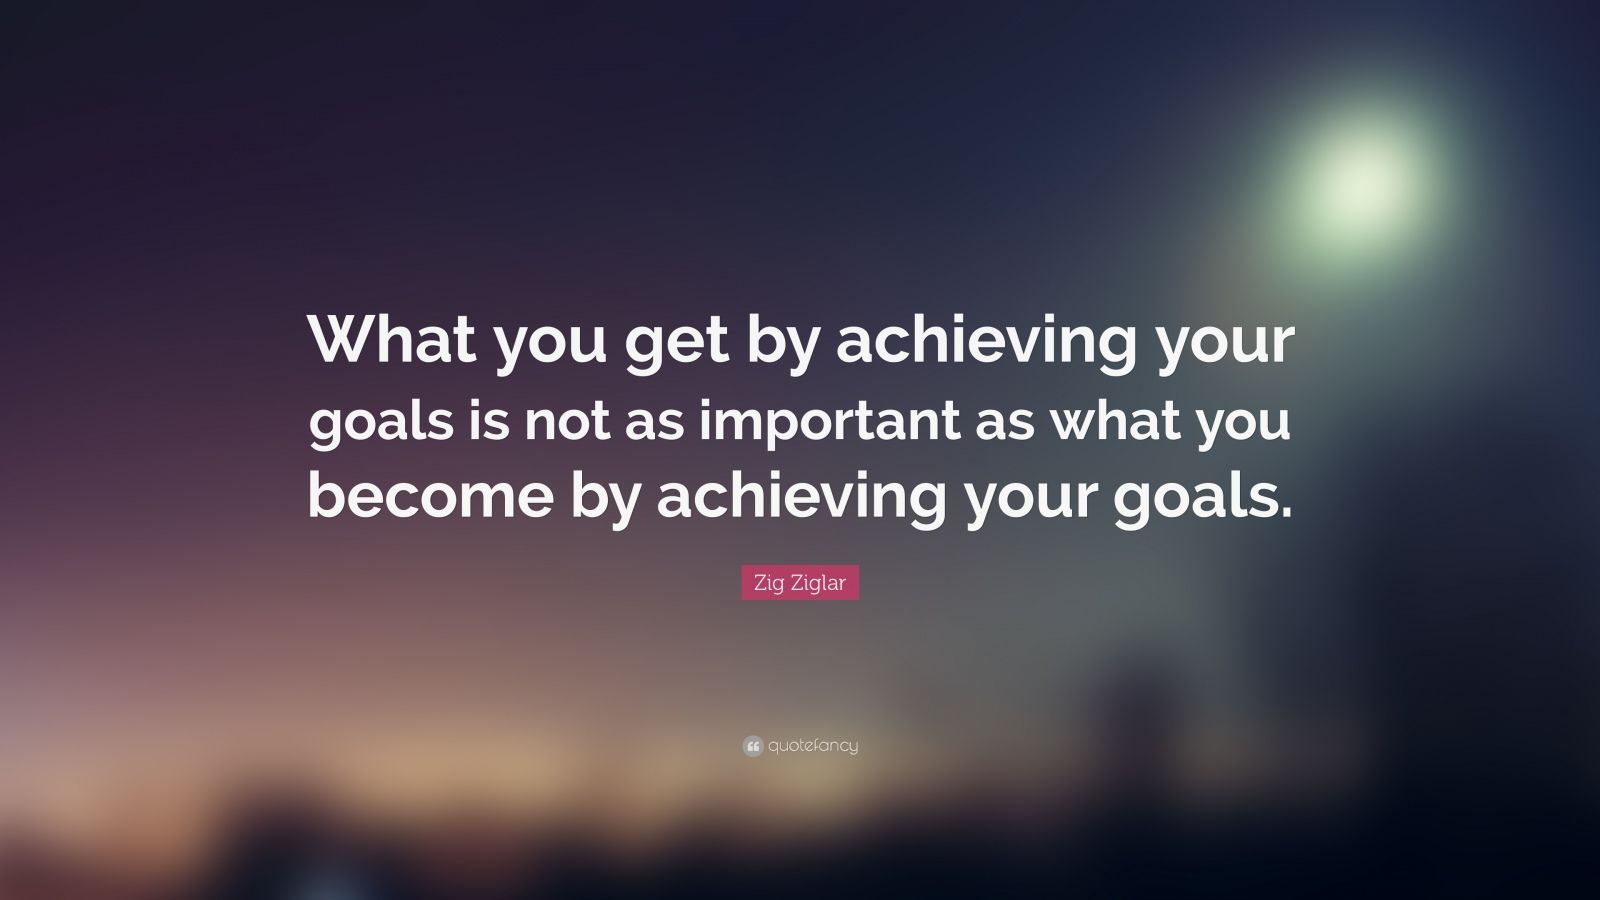 Quotes by Zig Ziglar On Goals